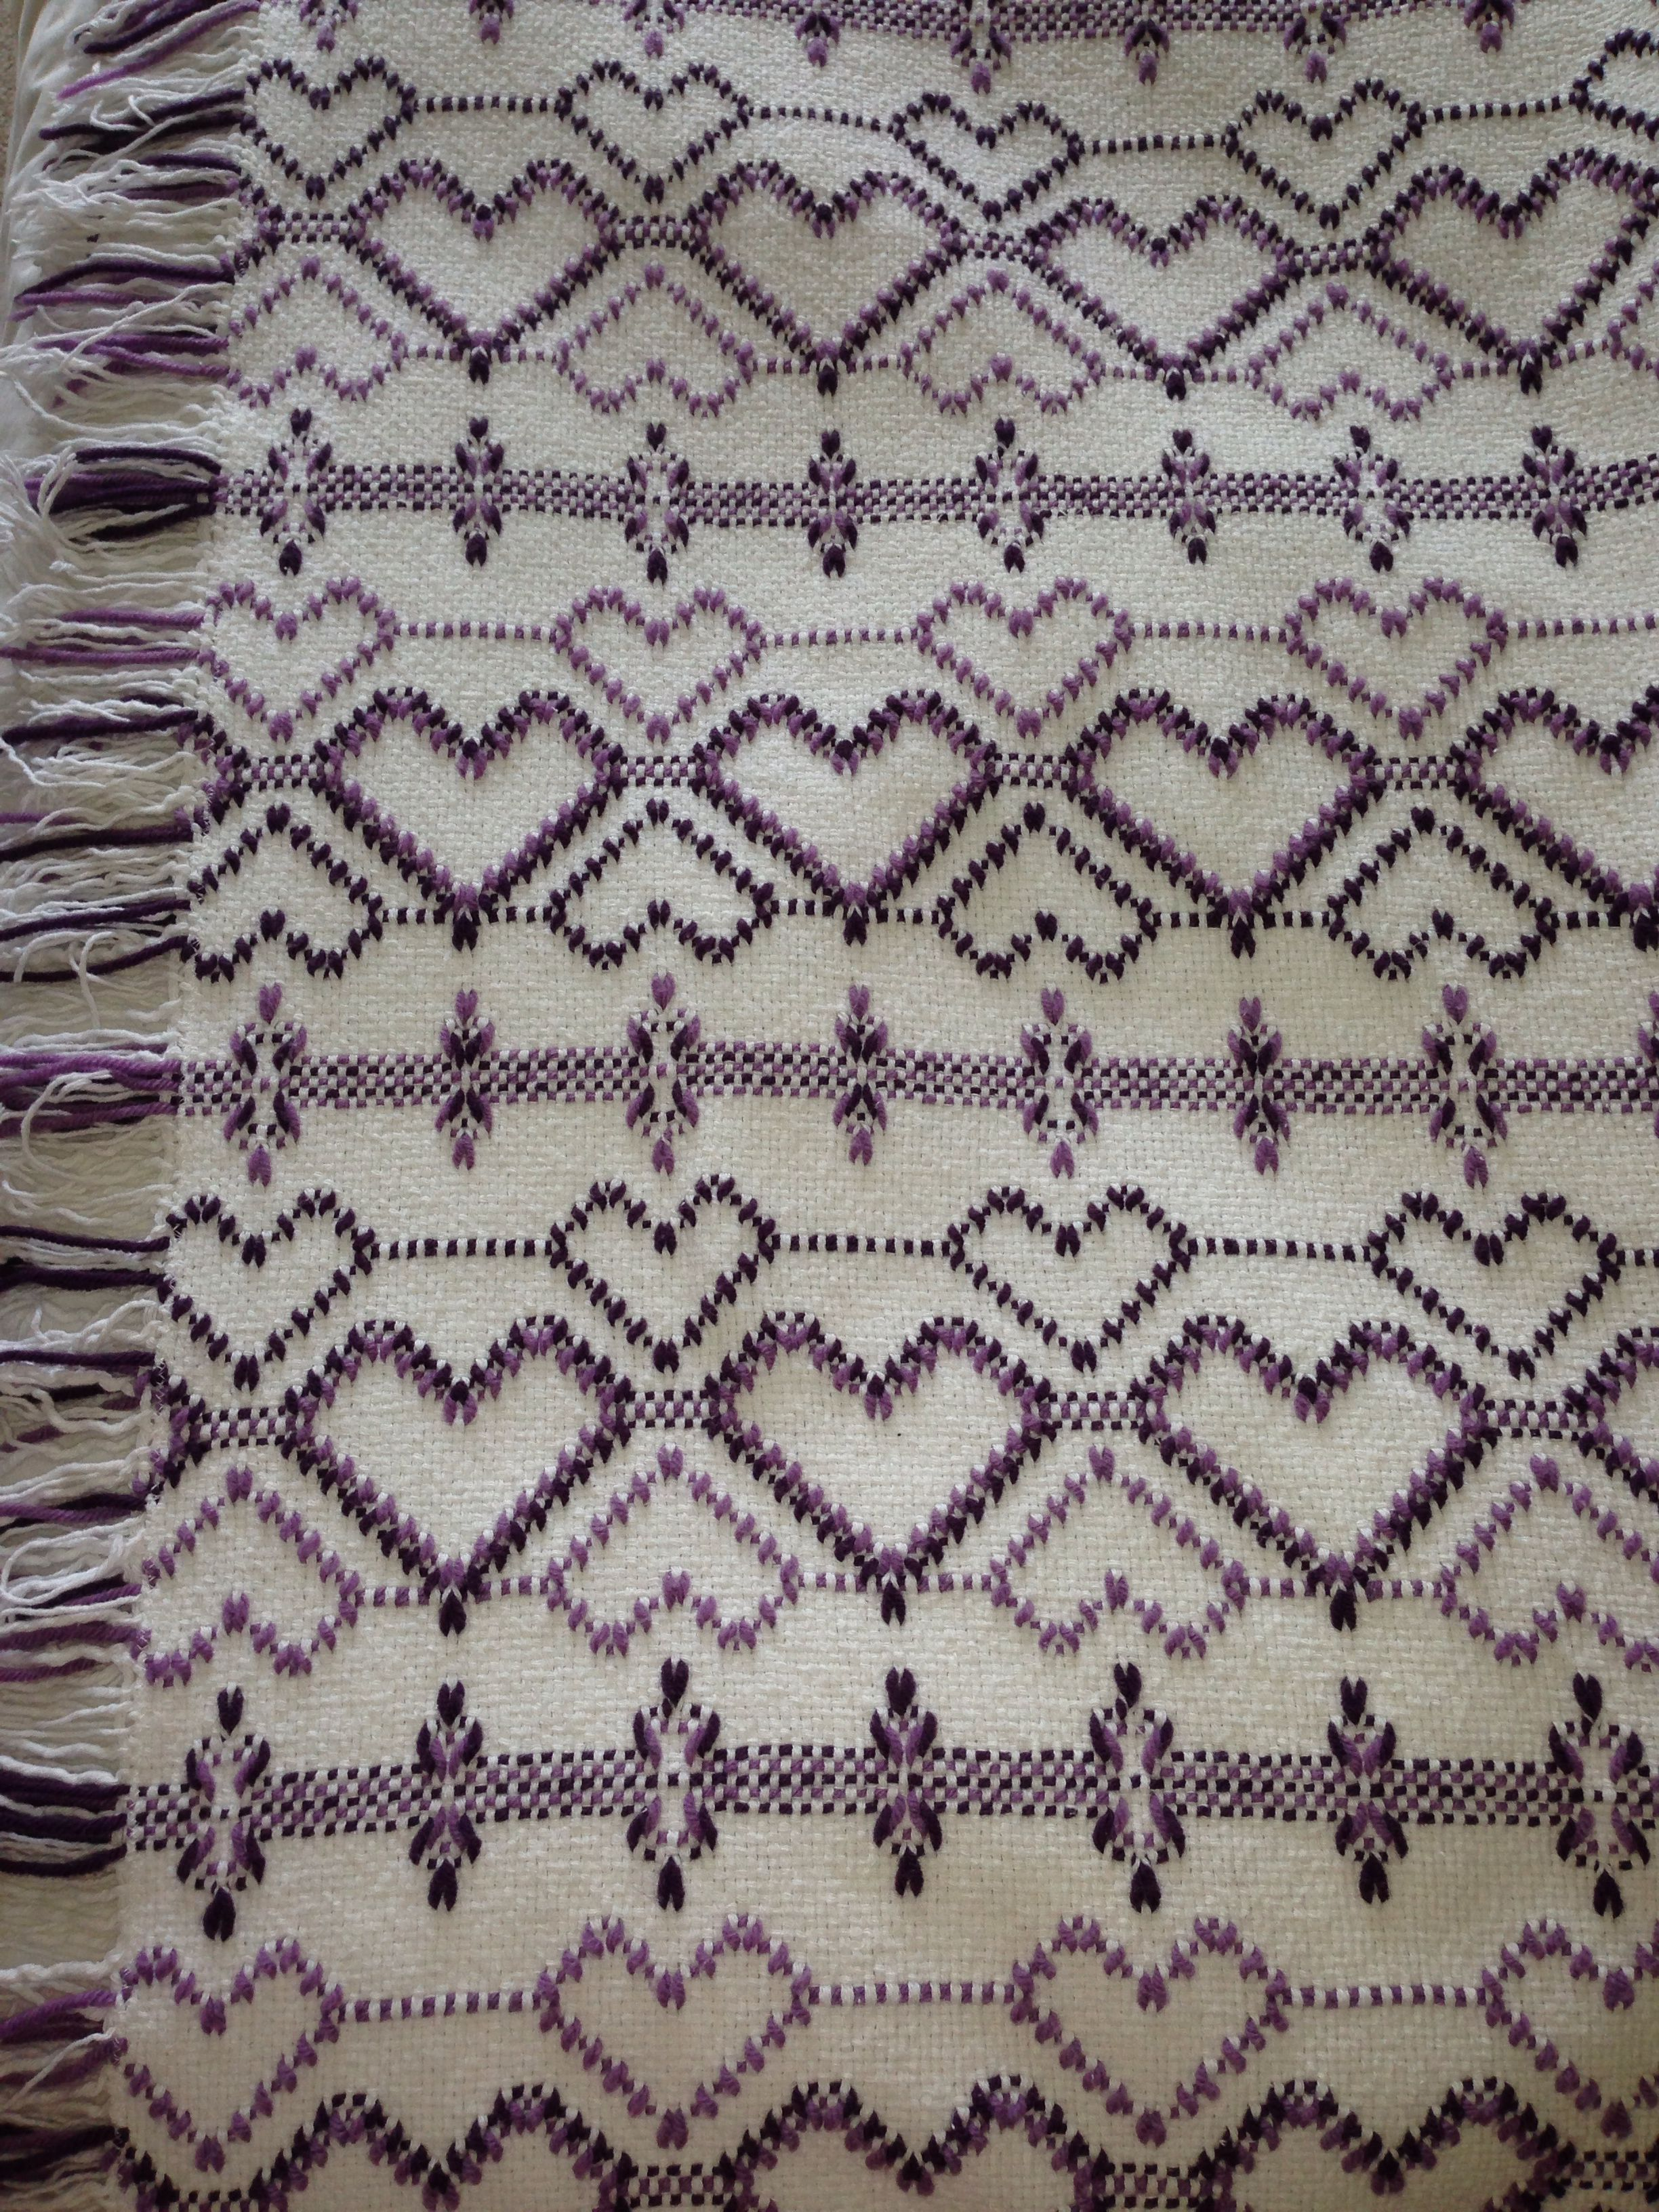 Swedish Weaving | Swedish weaving | Pinterest | Bordado, Lindo y Puntos